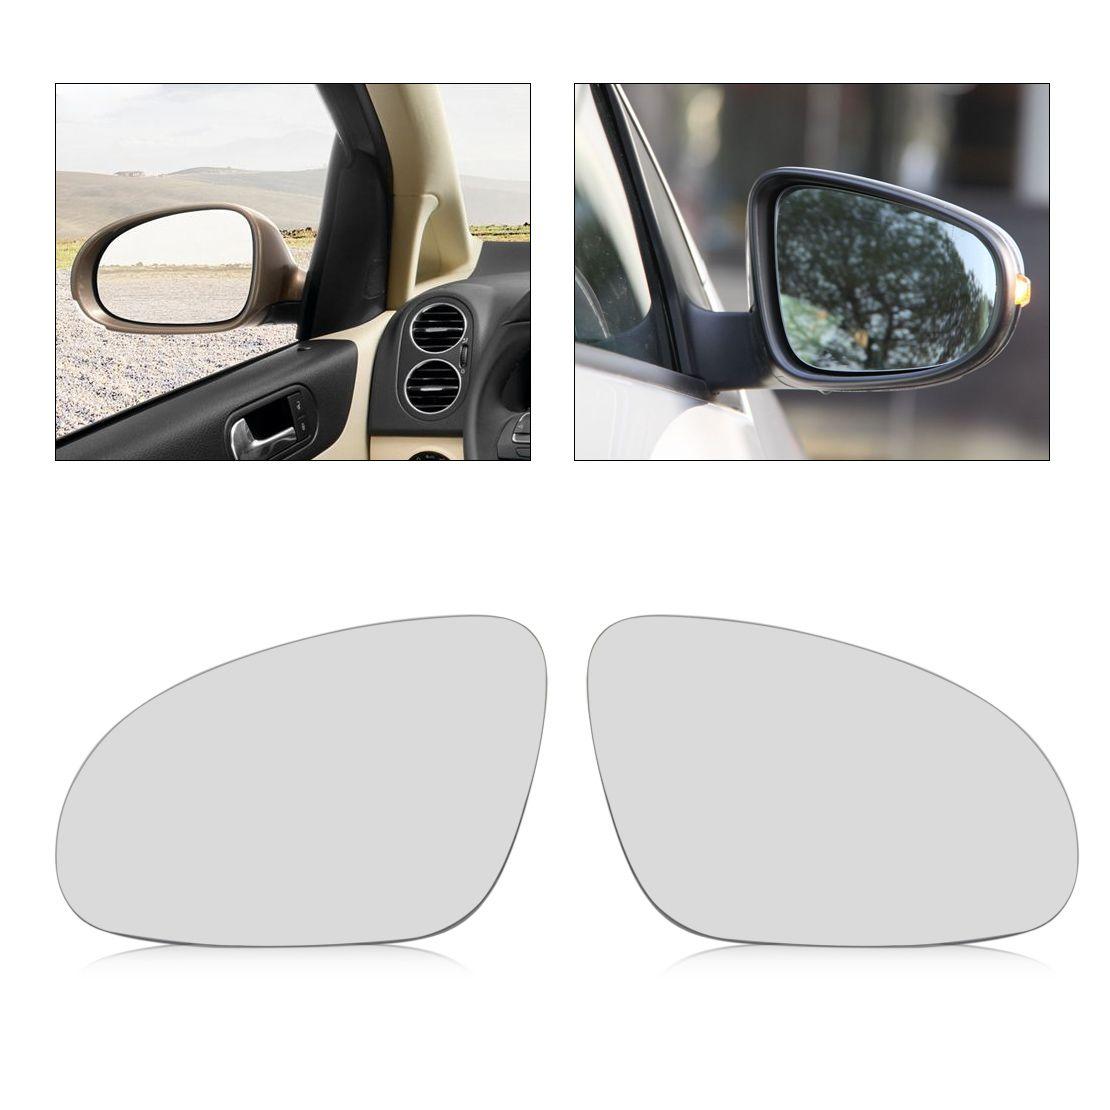 Passenger Side Mirror Replacement Glass for VW EOS GTI Jetta Passat R32 Rabbit